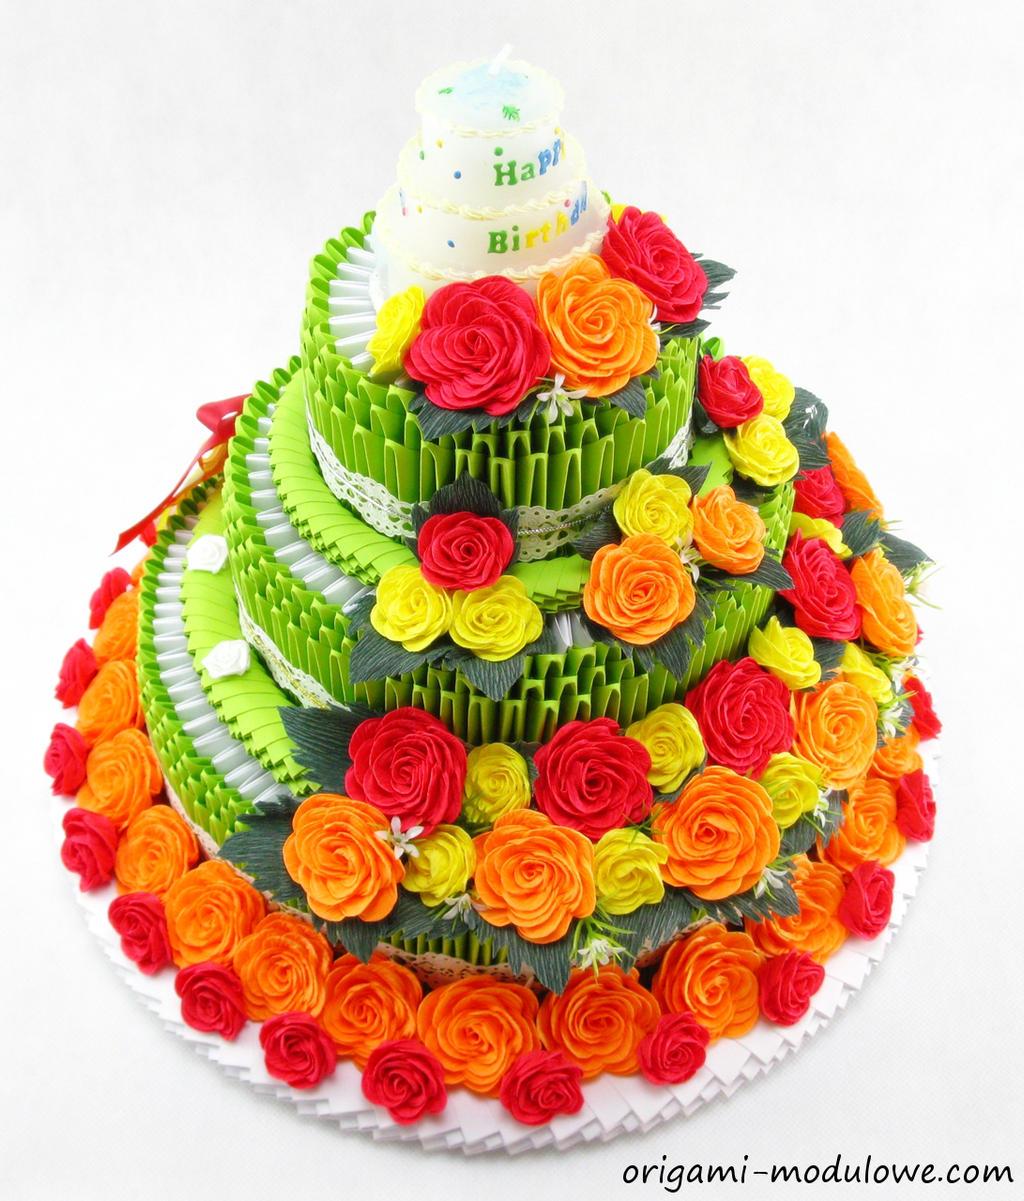 Modular Origami Birthday Cake 1 By Origamimodulowe